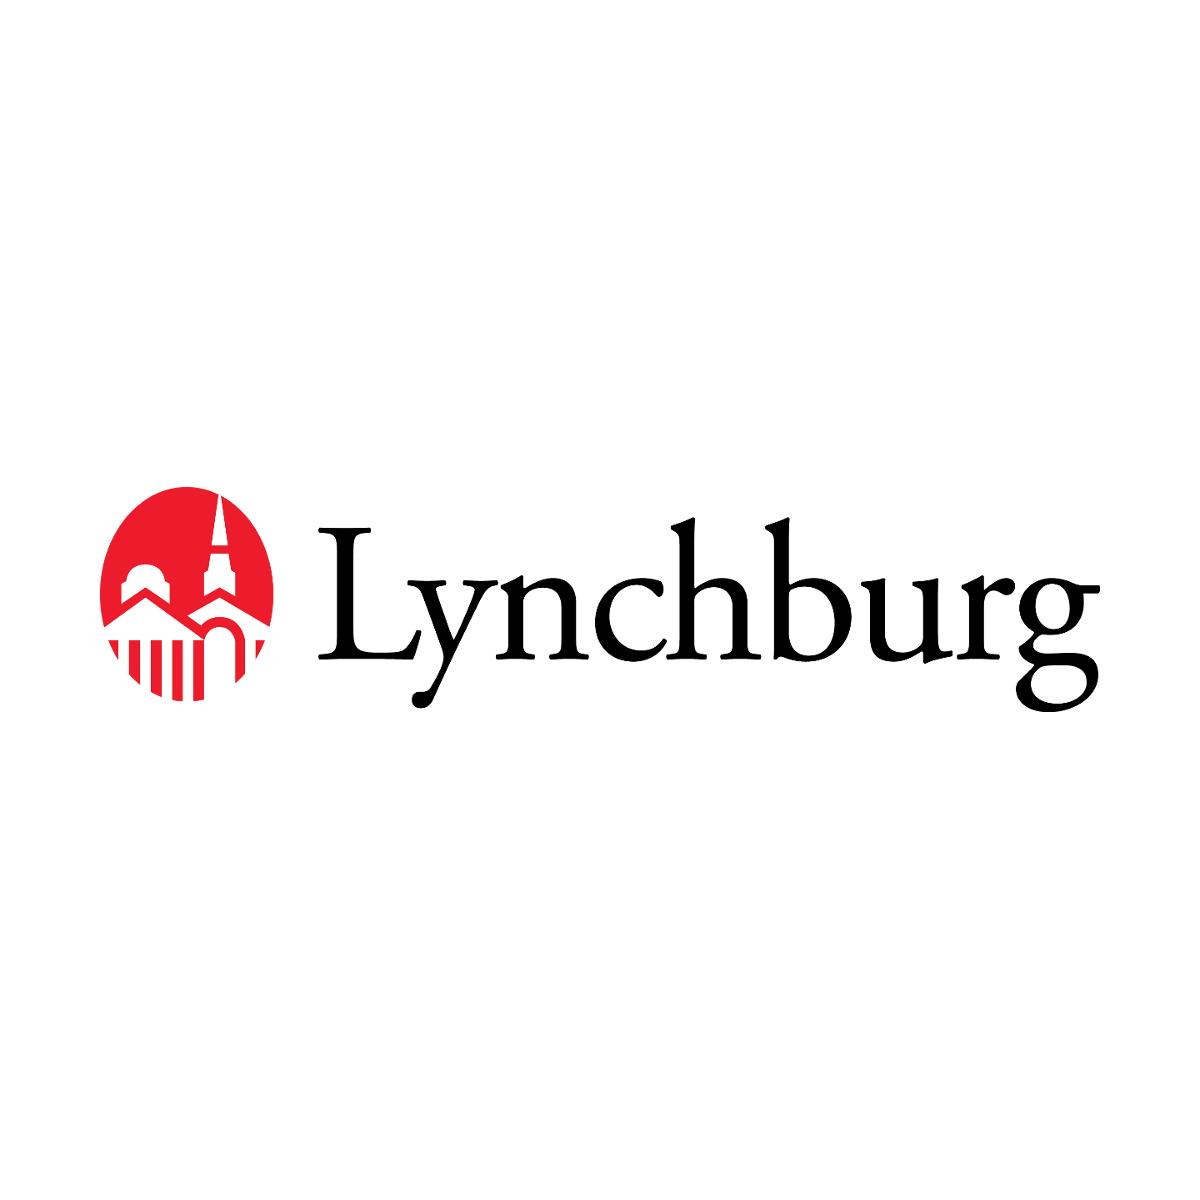 Travel and Maps – University of Lynchburg